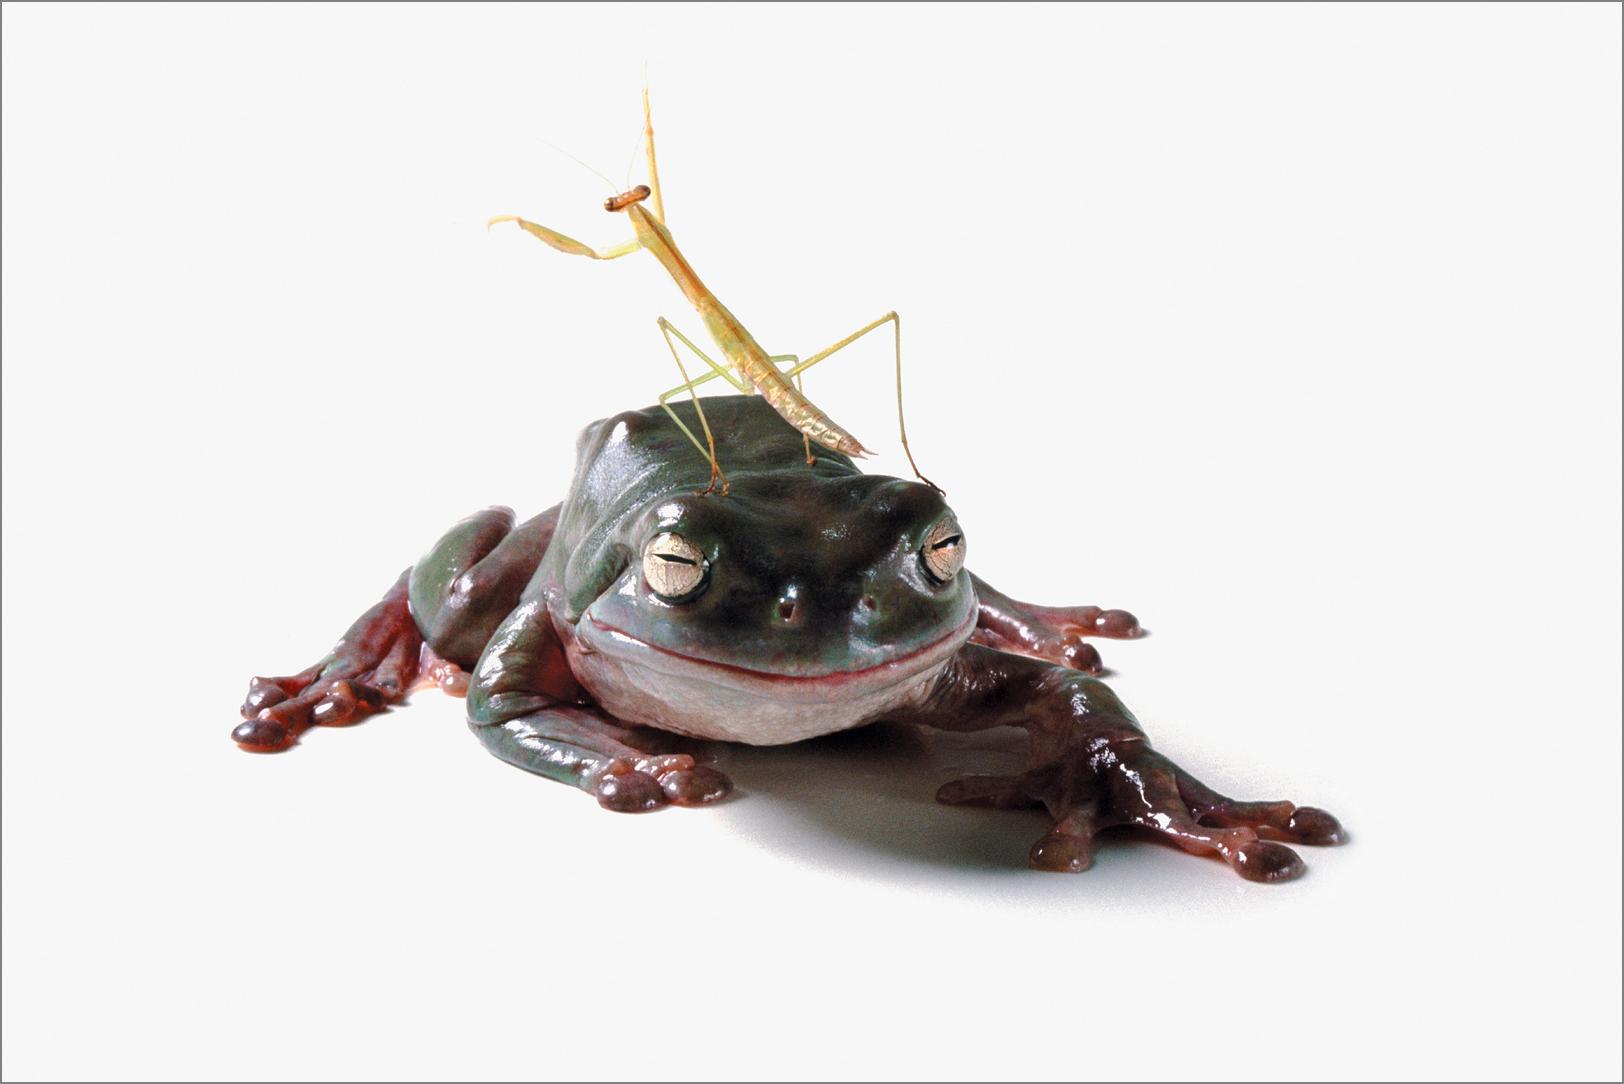 fc_frog5_4g.jpg